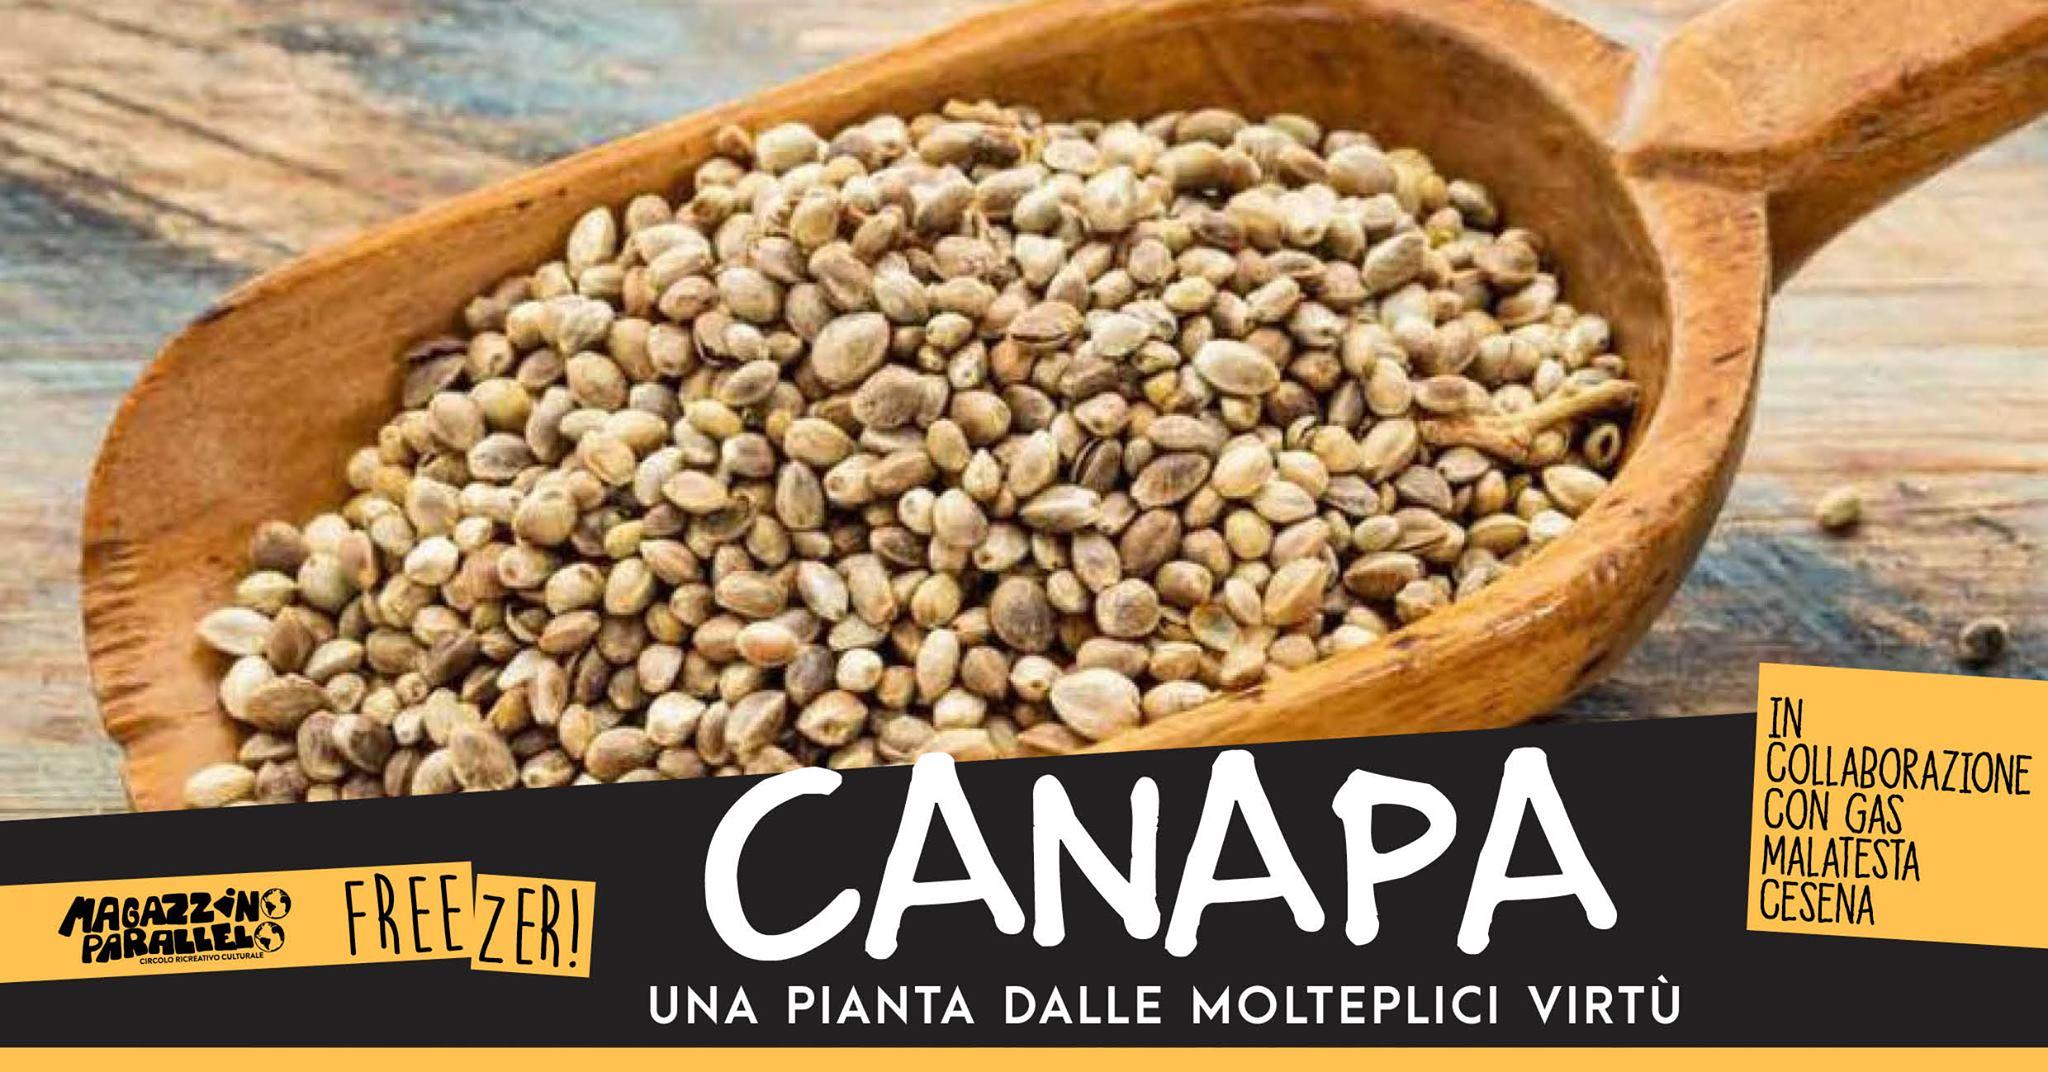 Parliamo di Canapa / at Freezer!